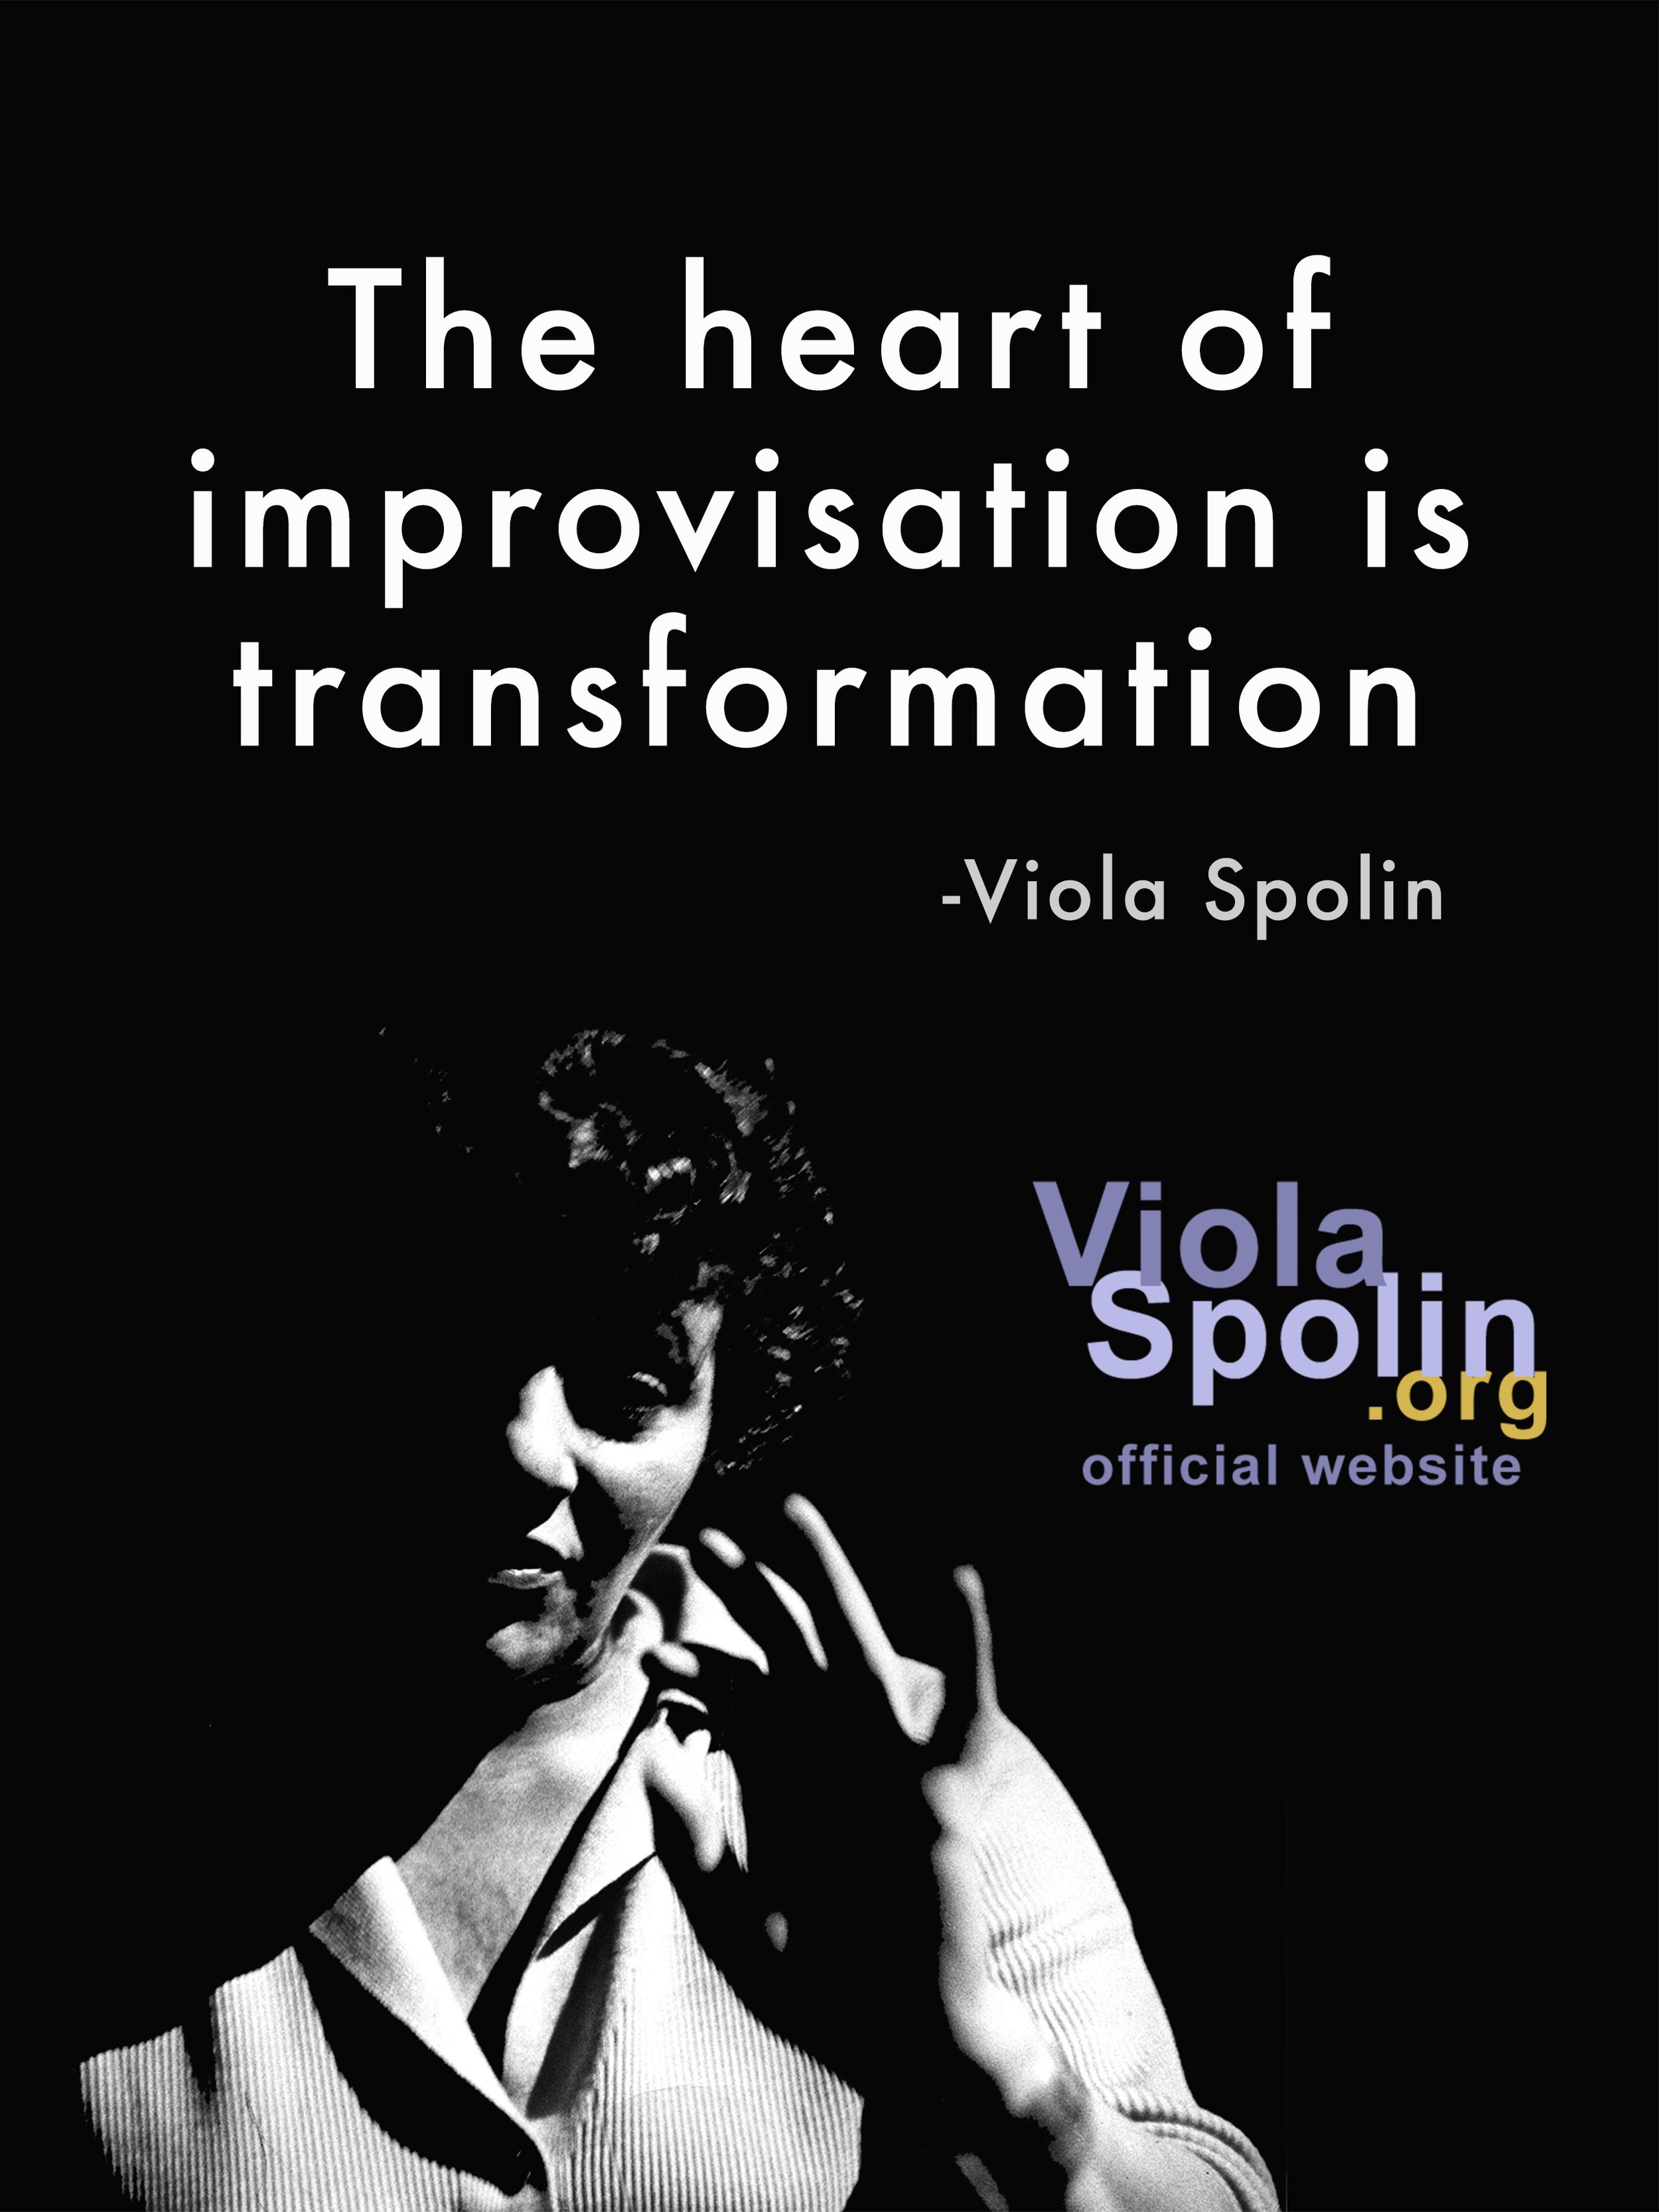 Viola Spolin Improvisation Meme